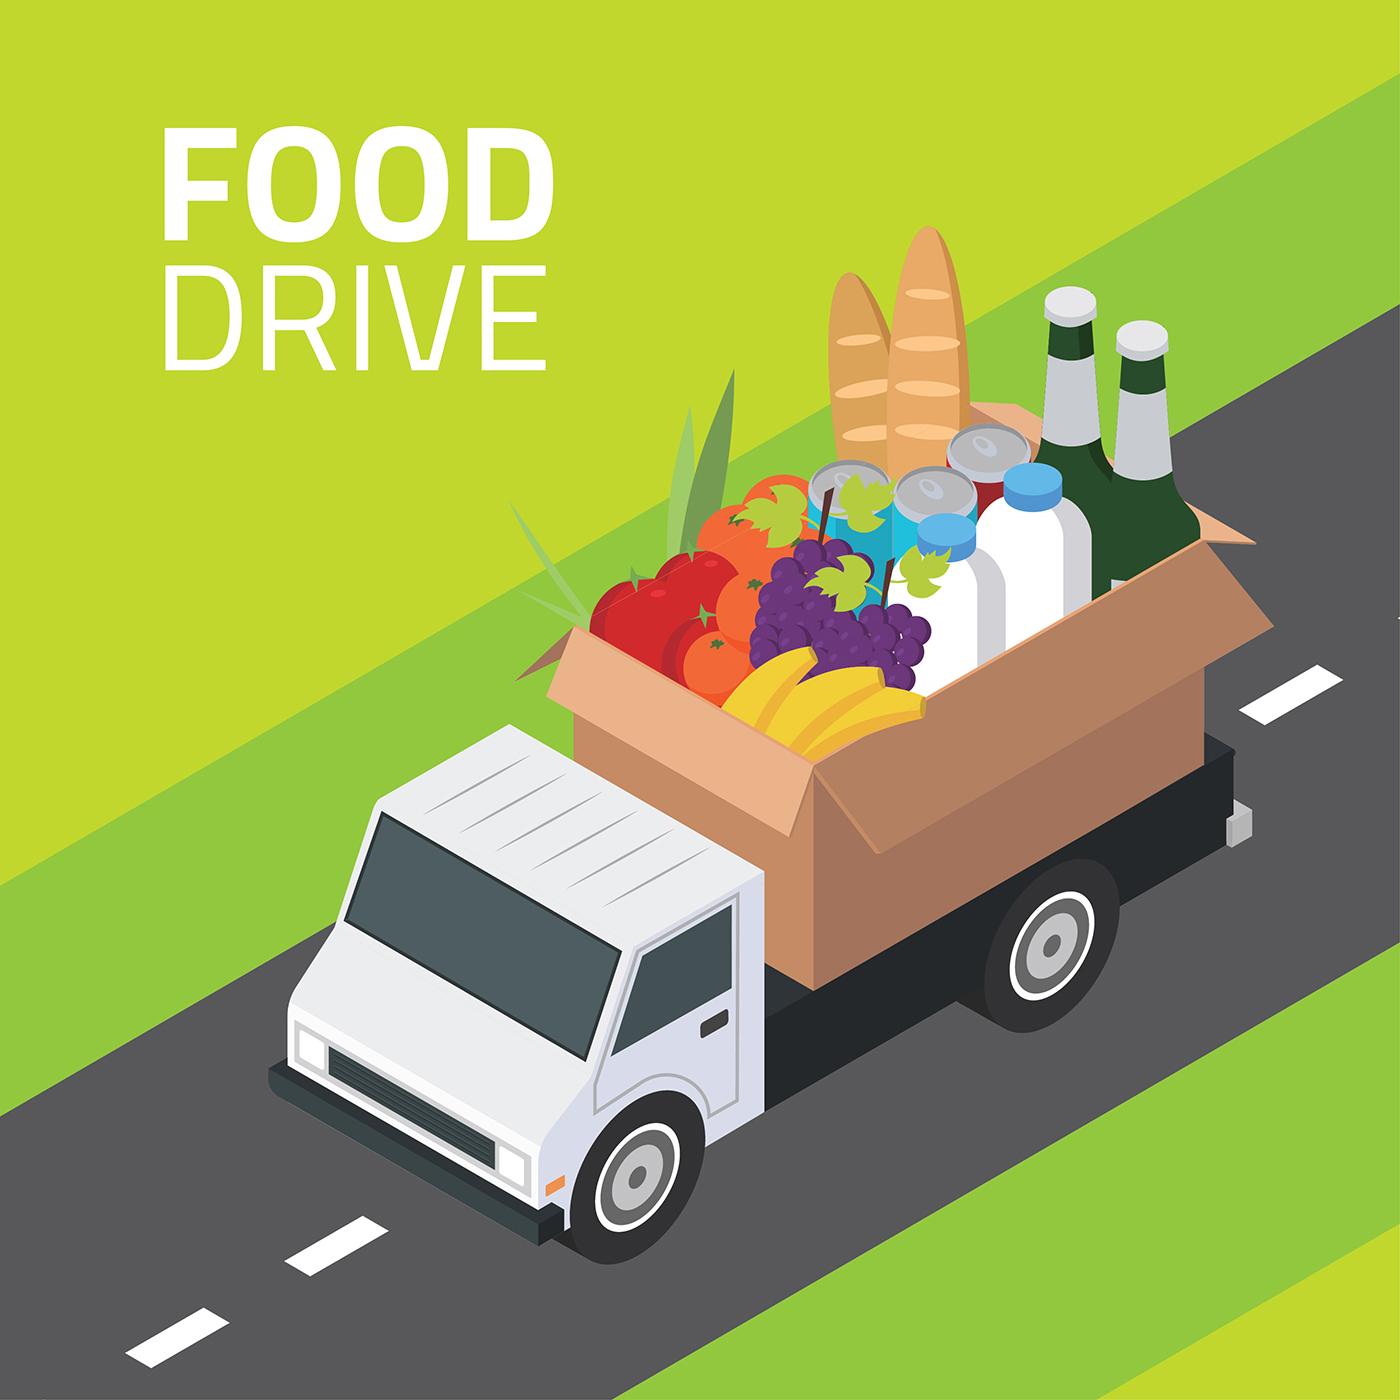 Food Drive Isometric Vector - Download Free Vector Art ...